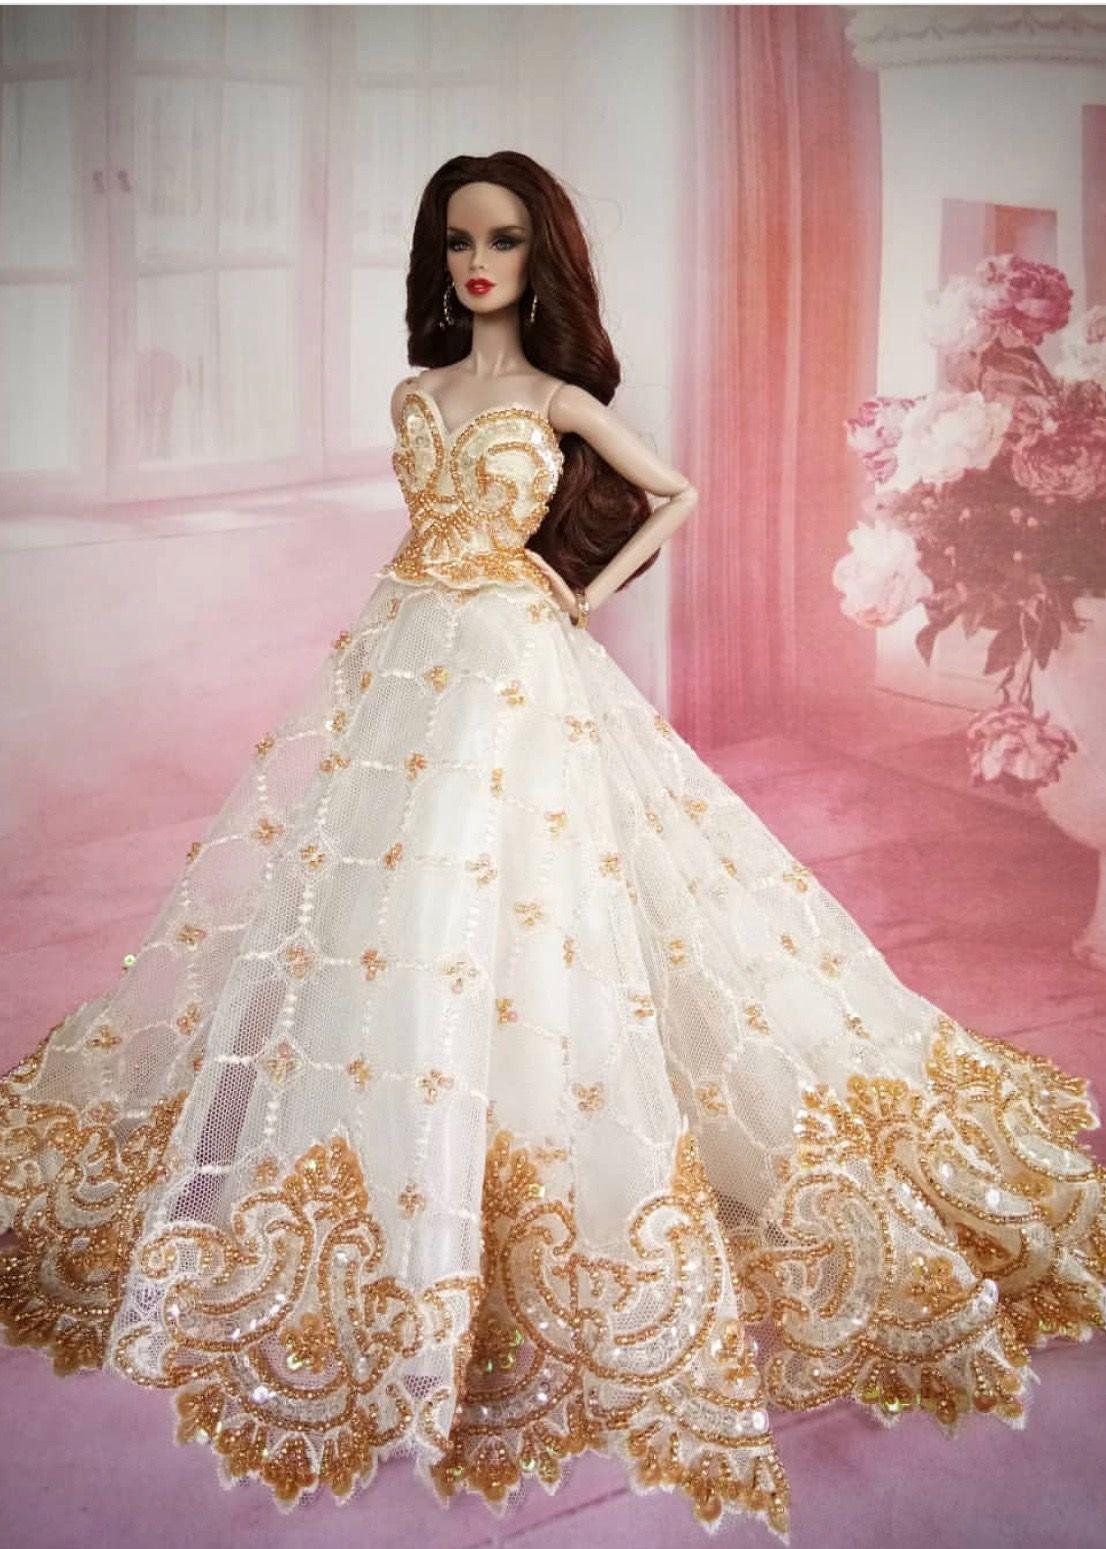 19.19.19/ by adum  Barbie wedding dress, Barbie gowns, Barbie bride